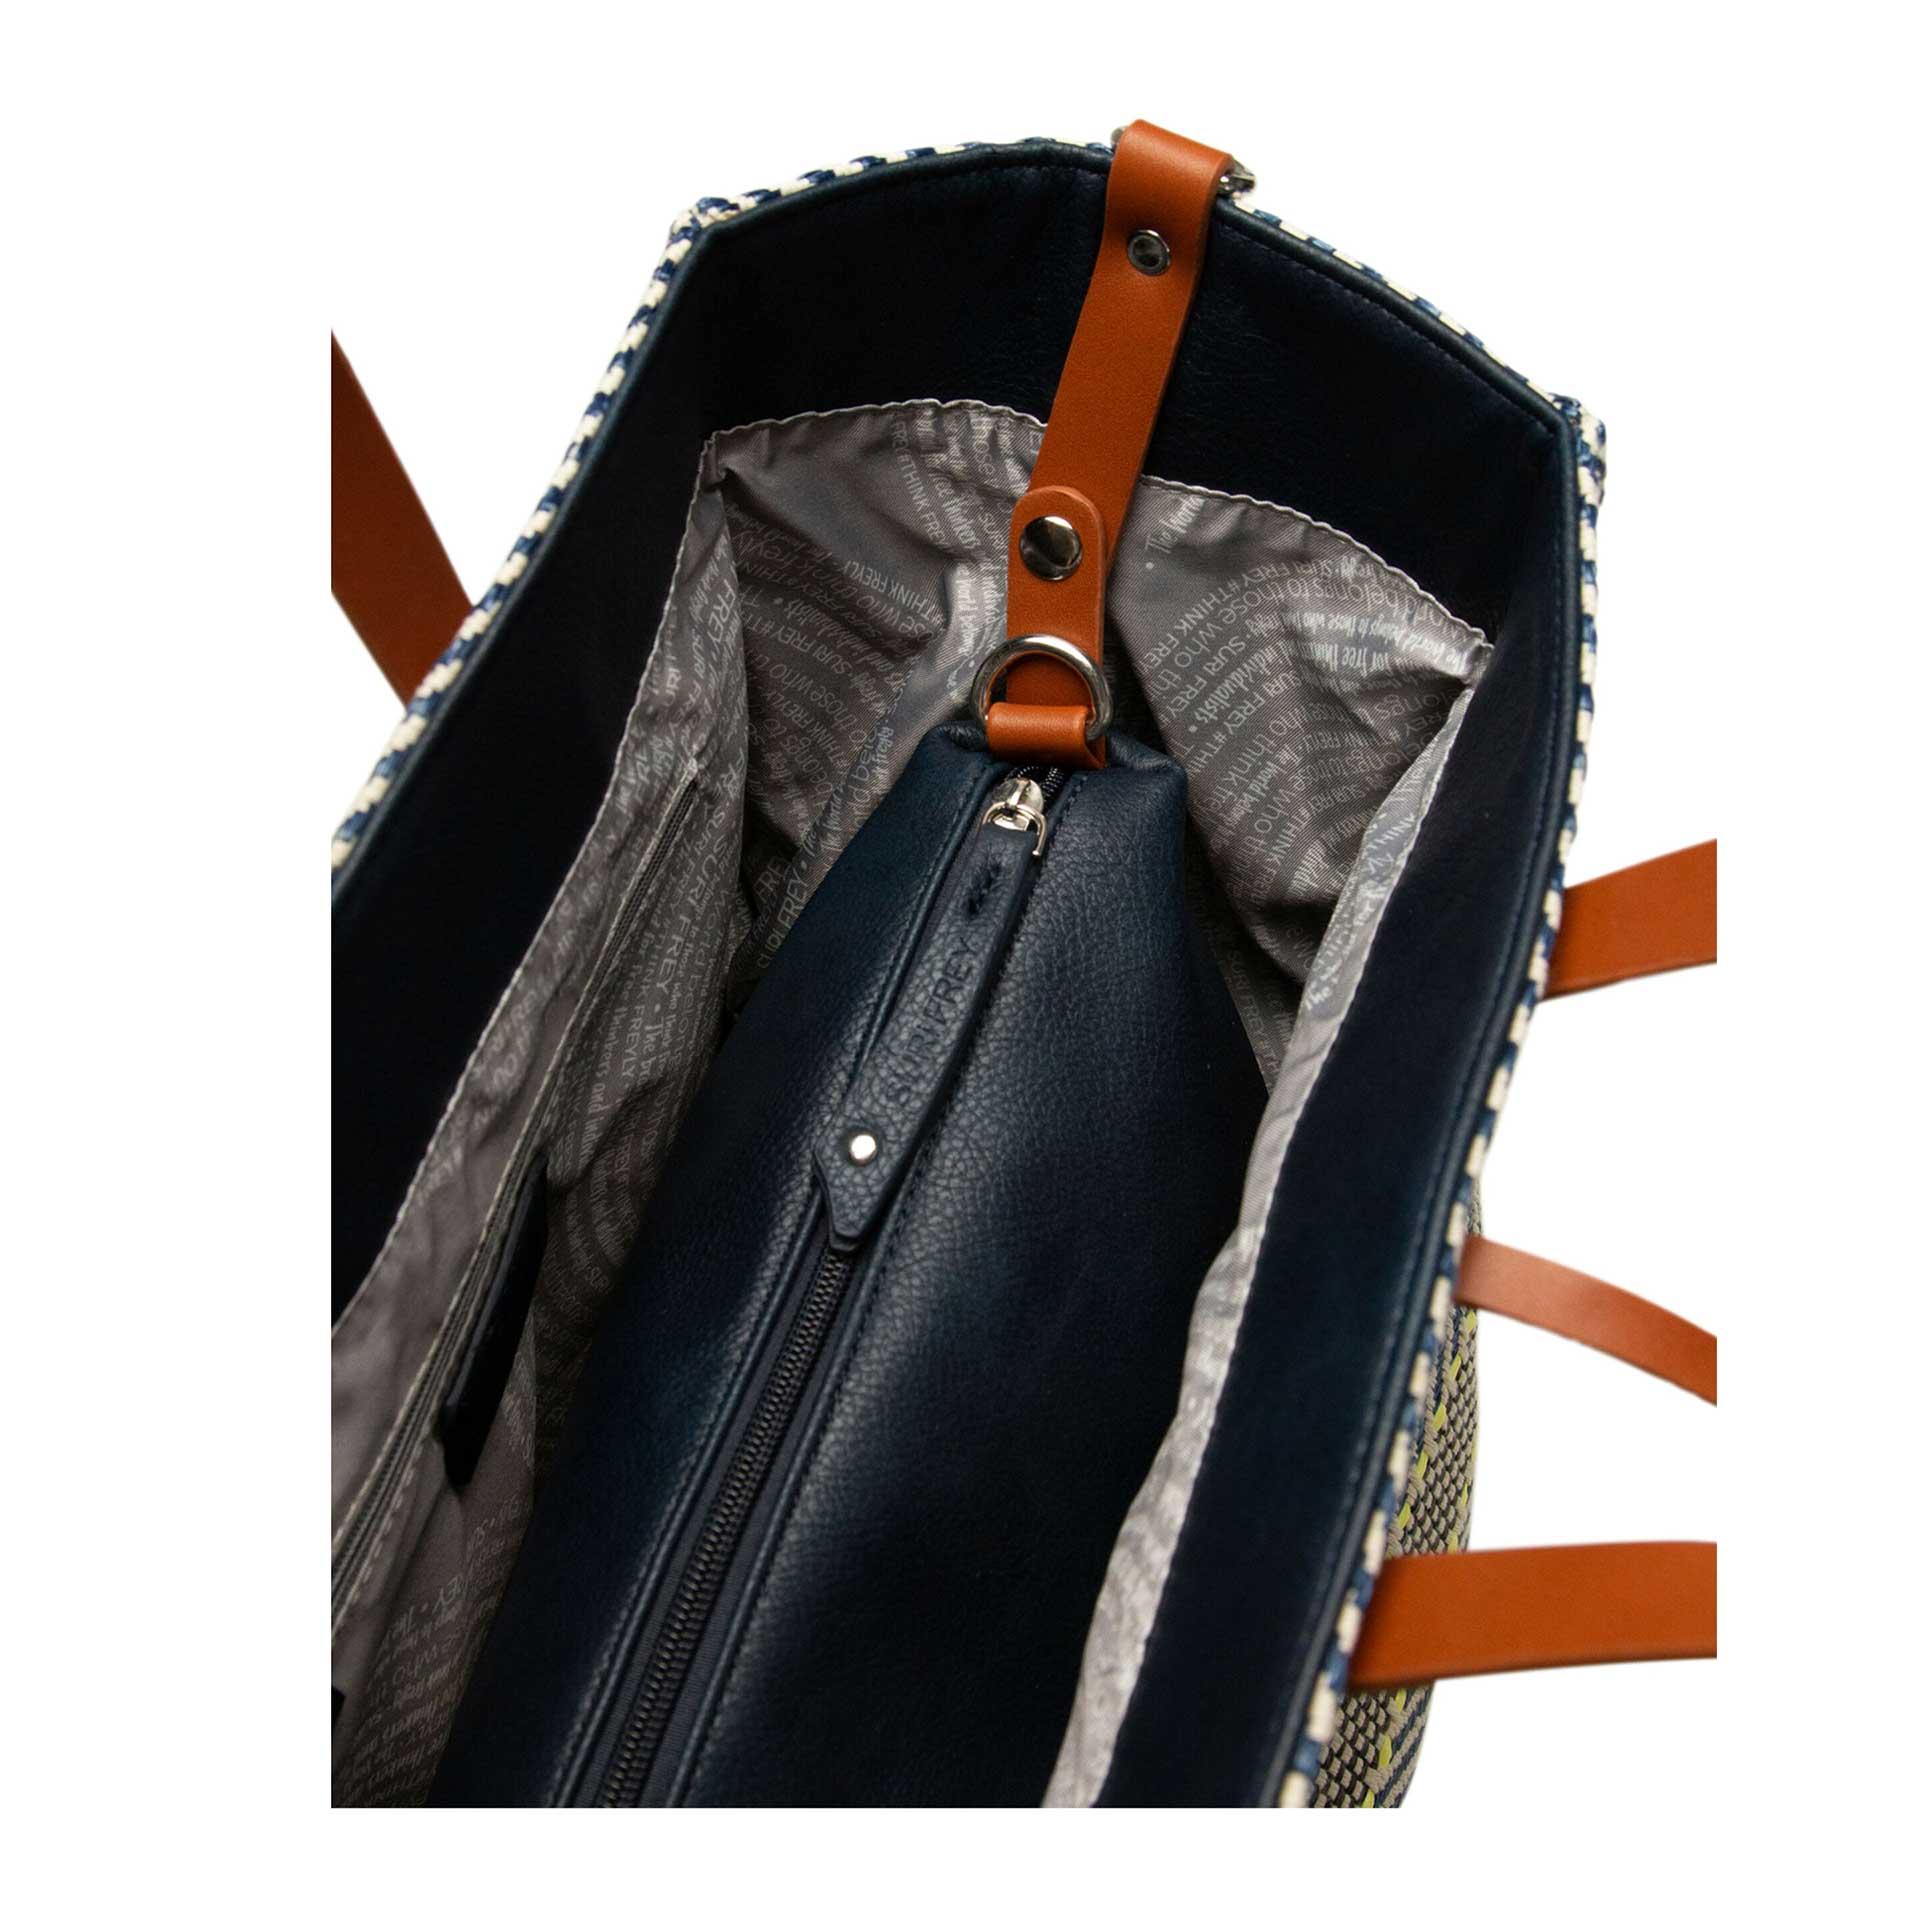 Suri Black Label Gracy Handtasche gestreift 2 in 1 blue